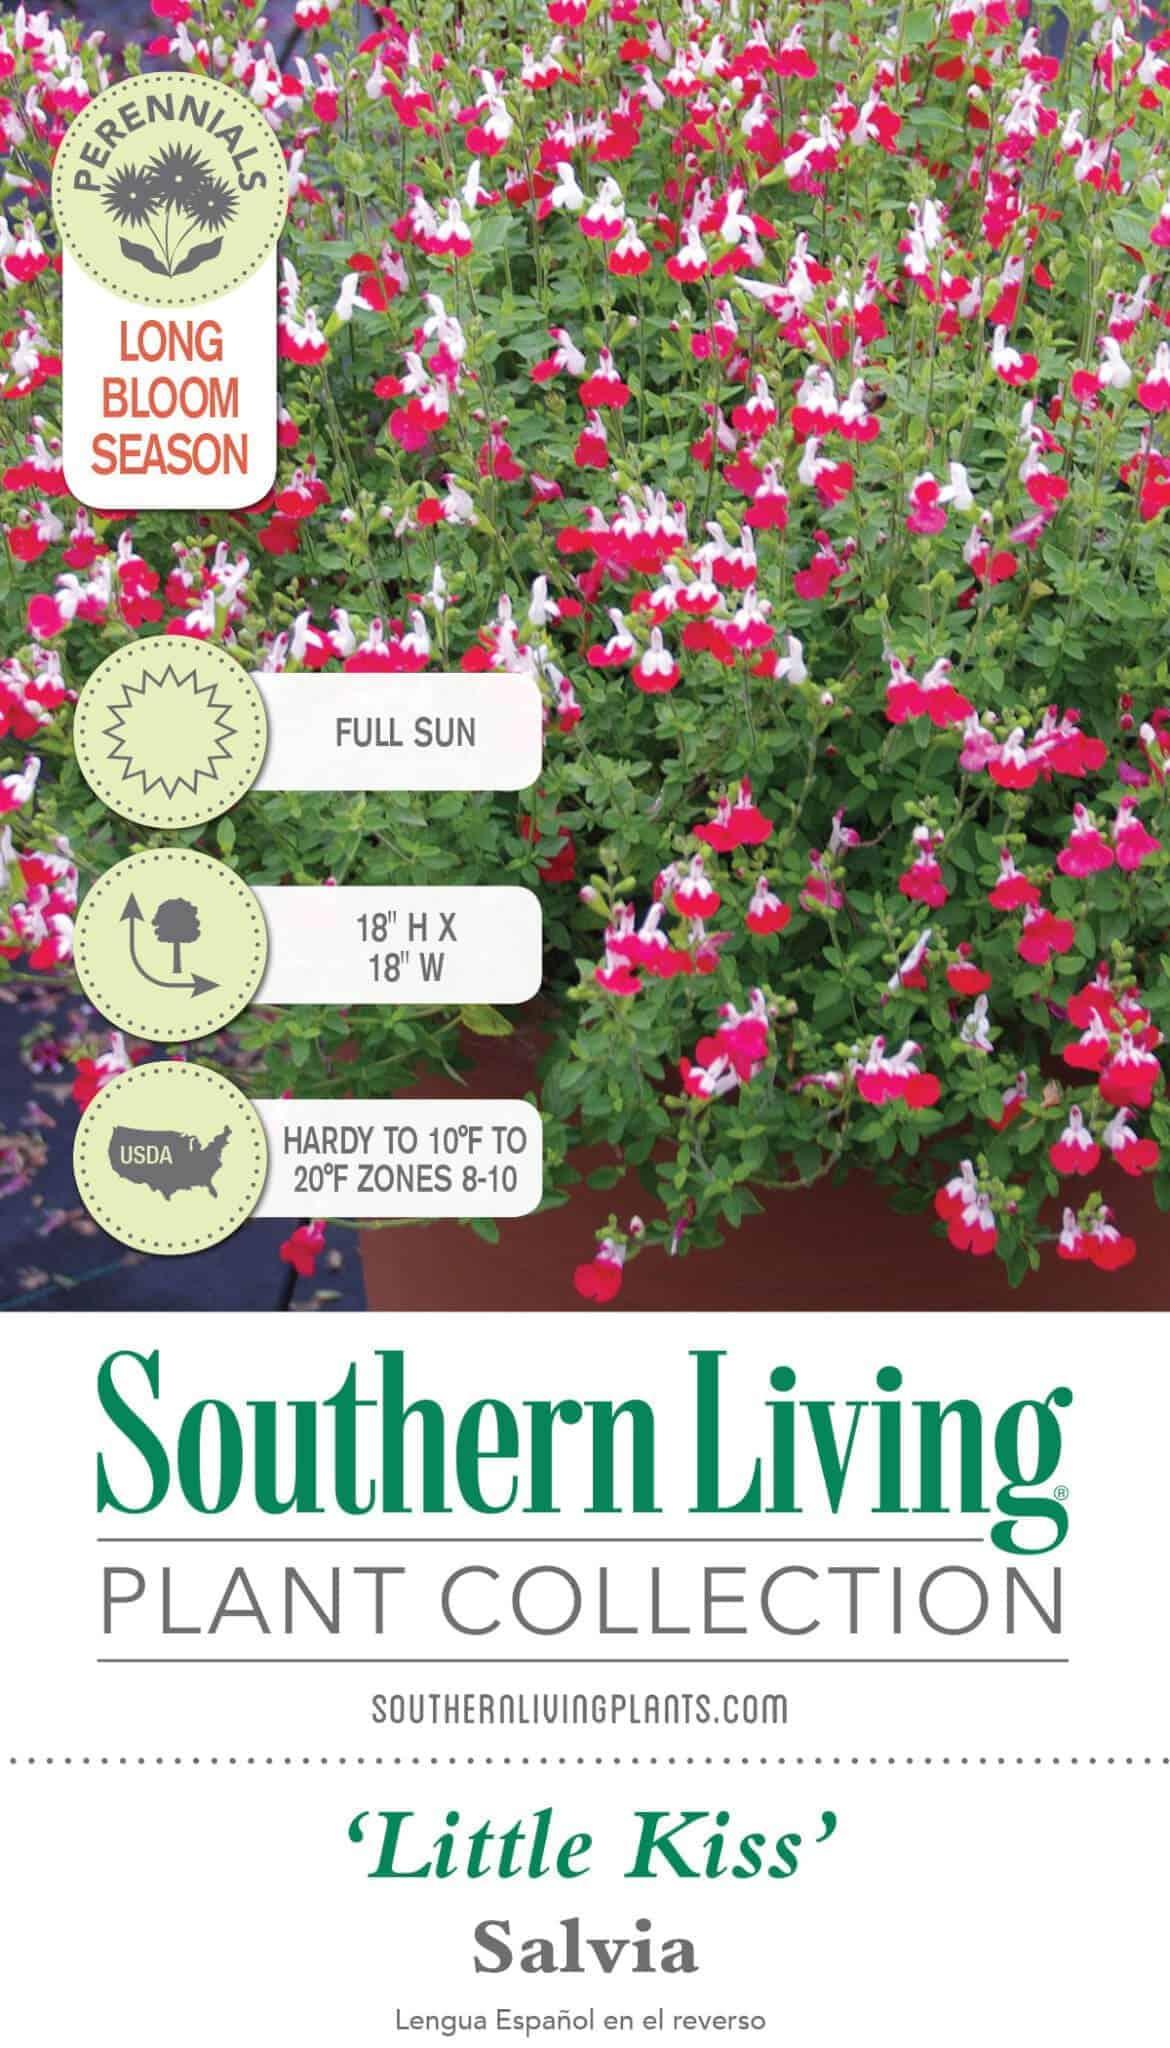 Little Kiss Salvia Shop Online With Plantsbymail Com